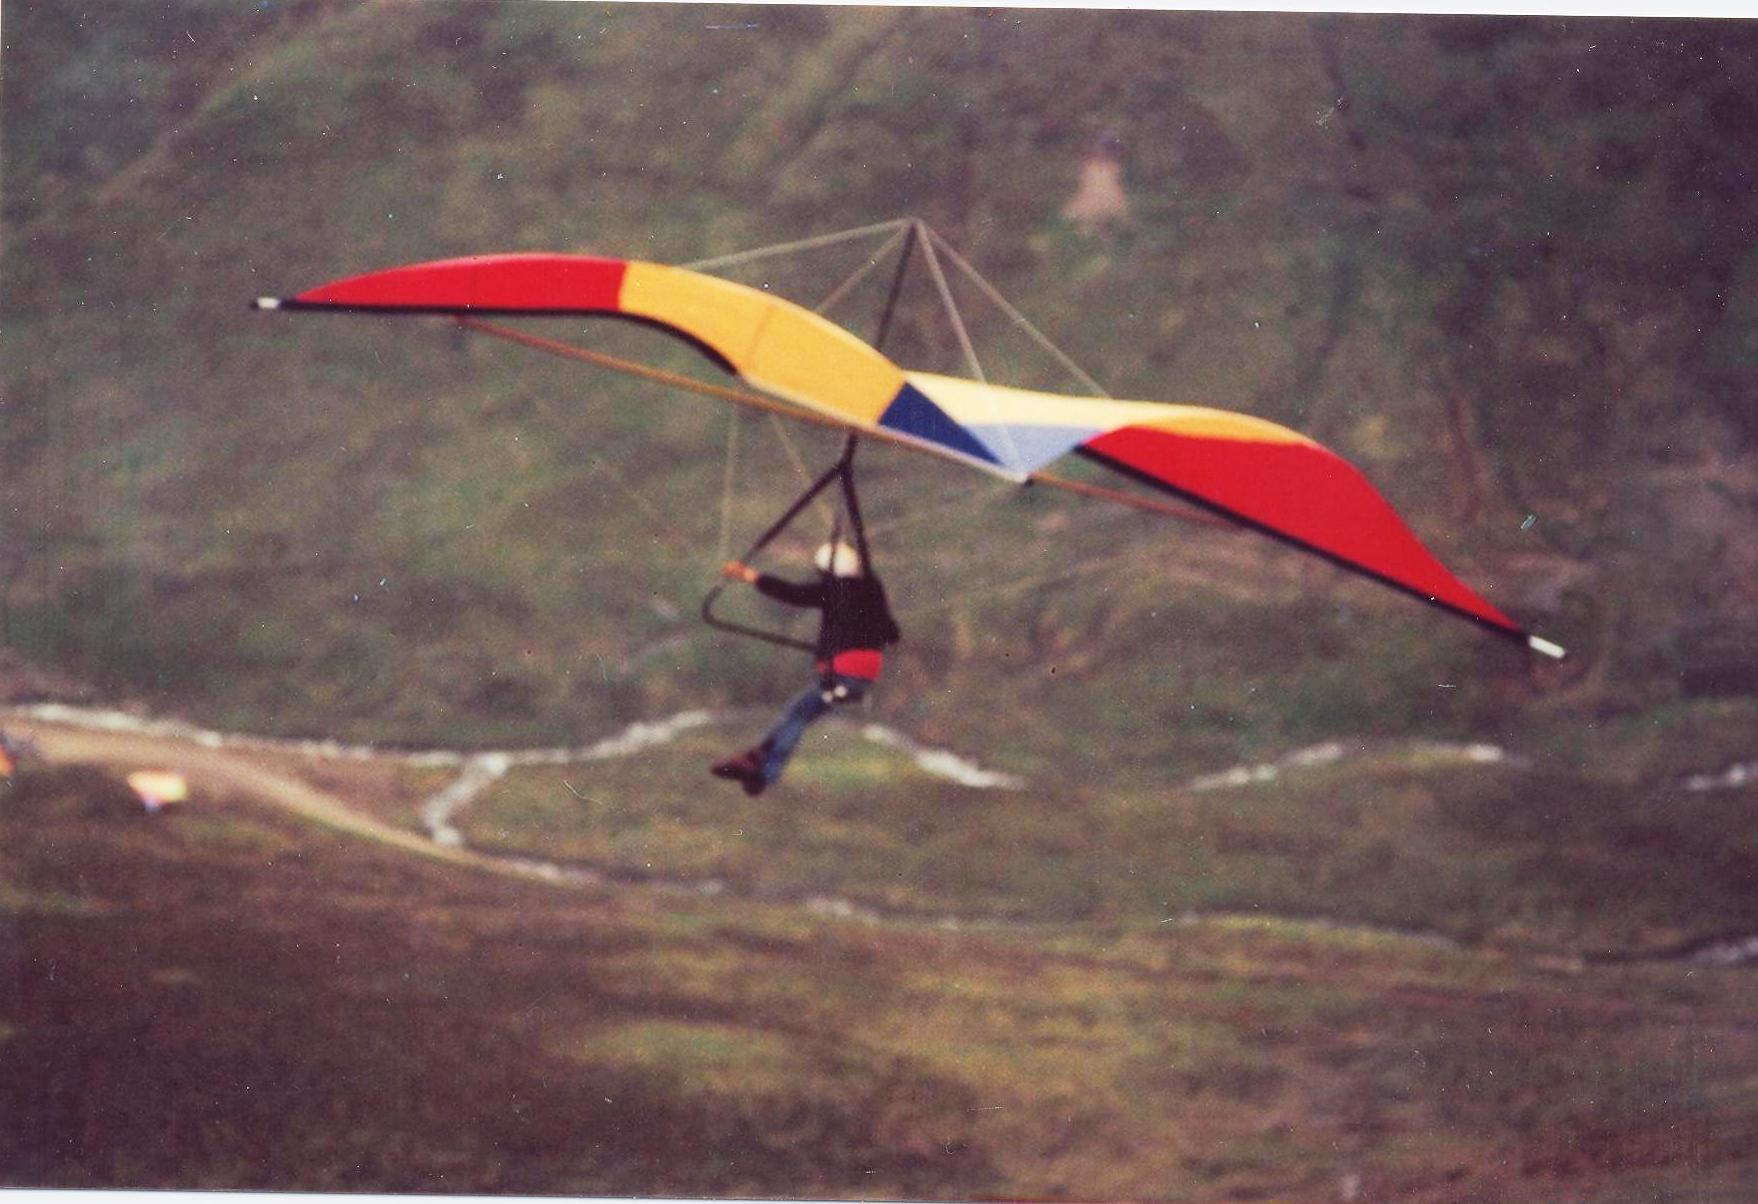 bill-sheka-hatchers-pass-july-4-1975-seagull3-heading-for-landing-area-and-pickup